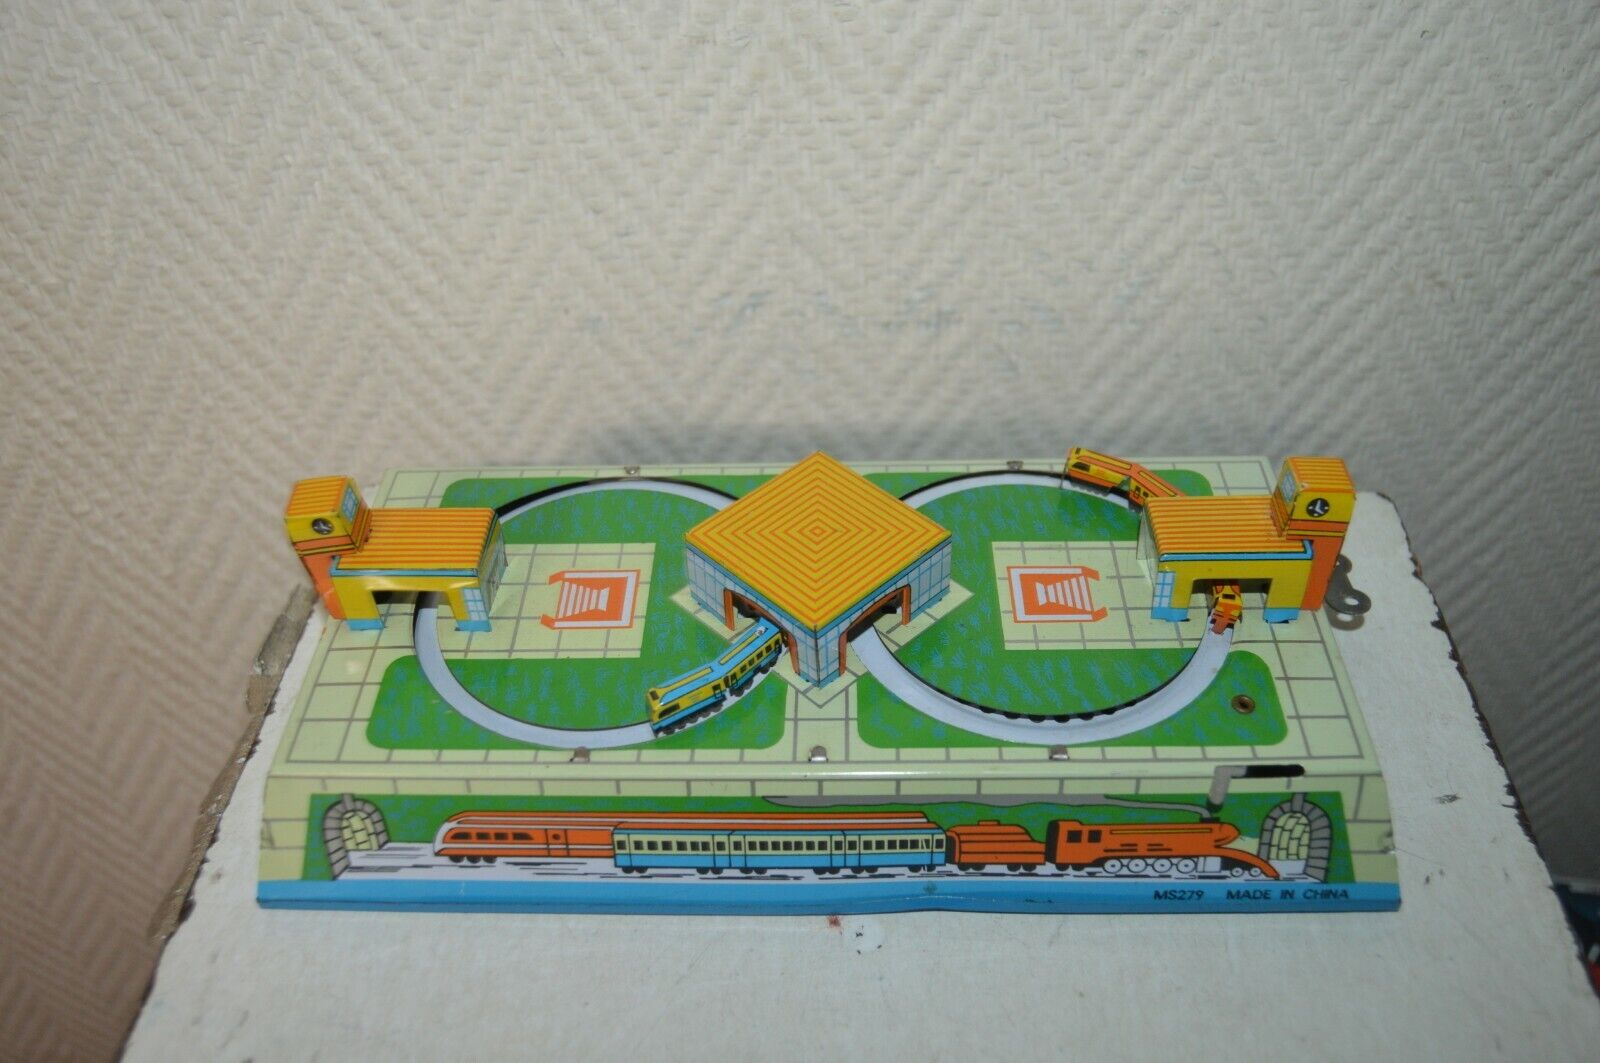 Small circuit train mechanics ms 279 steel vintage 1980 with key 23x10